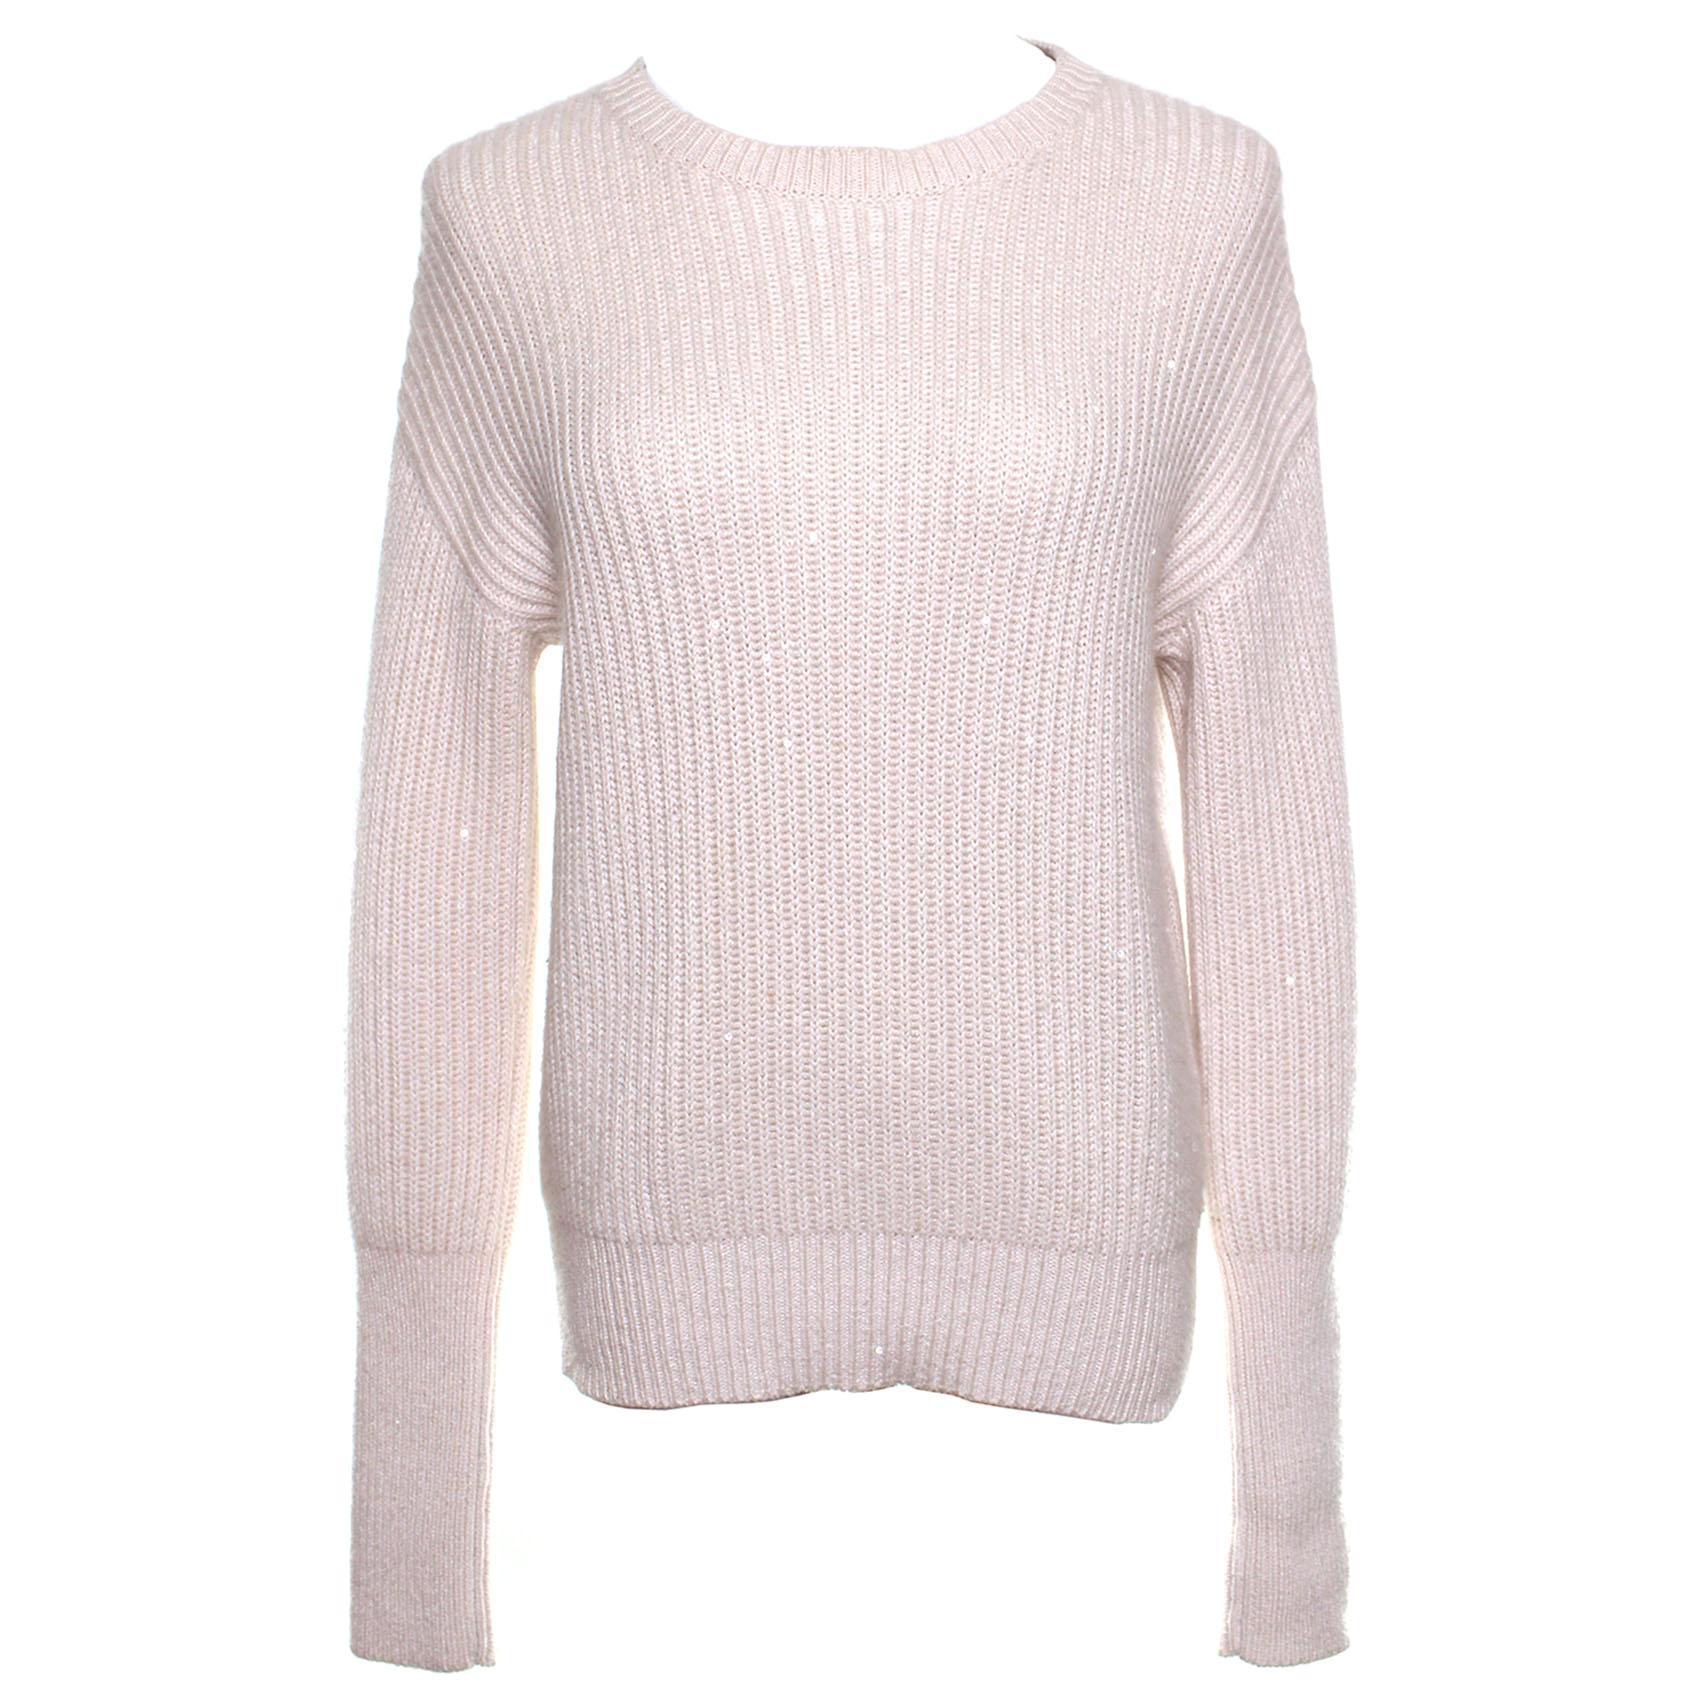 Brunello Cucinelli Large Knit Cashmere Sweater